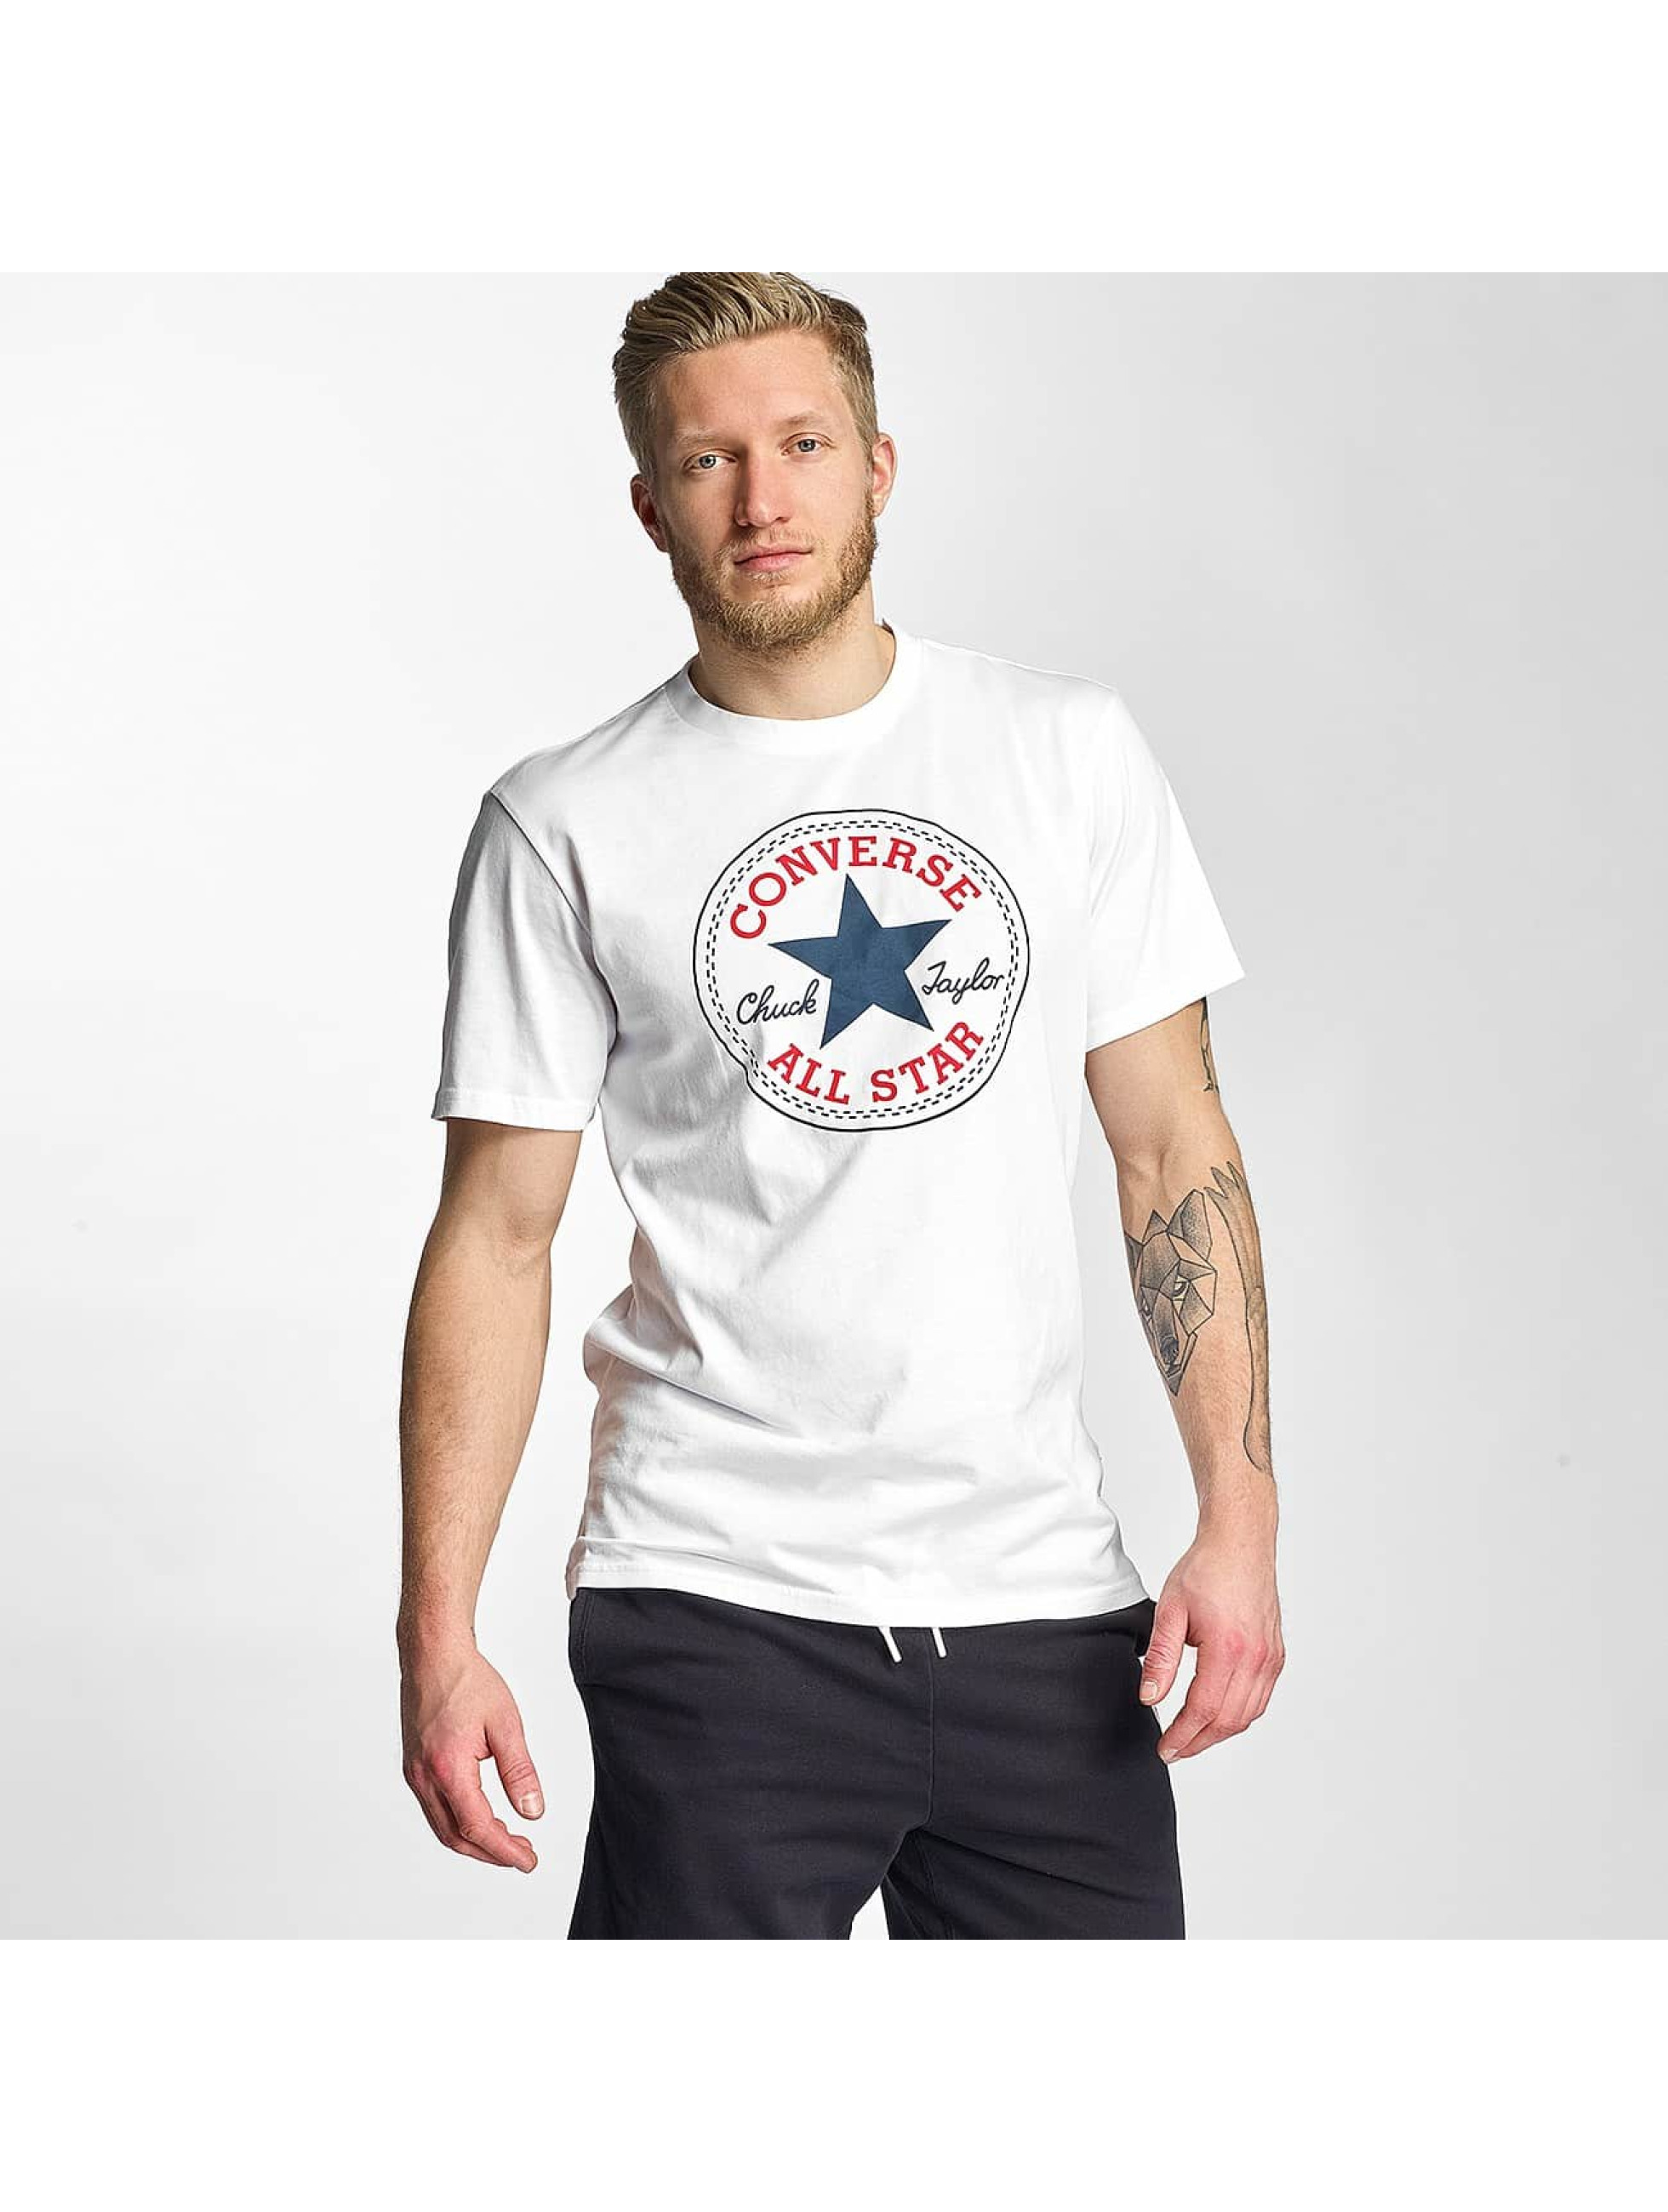 Converse Haut / T-Shirt Core Chuck en blanc